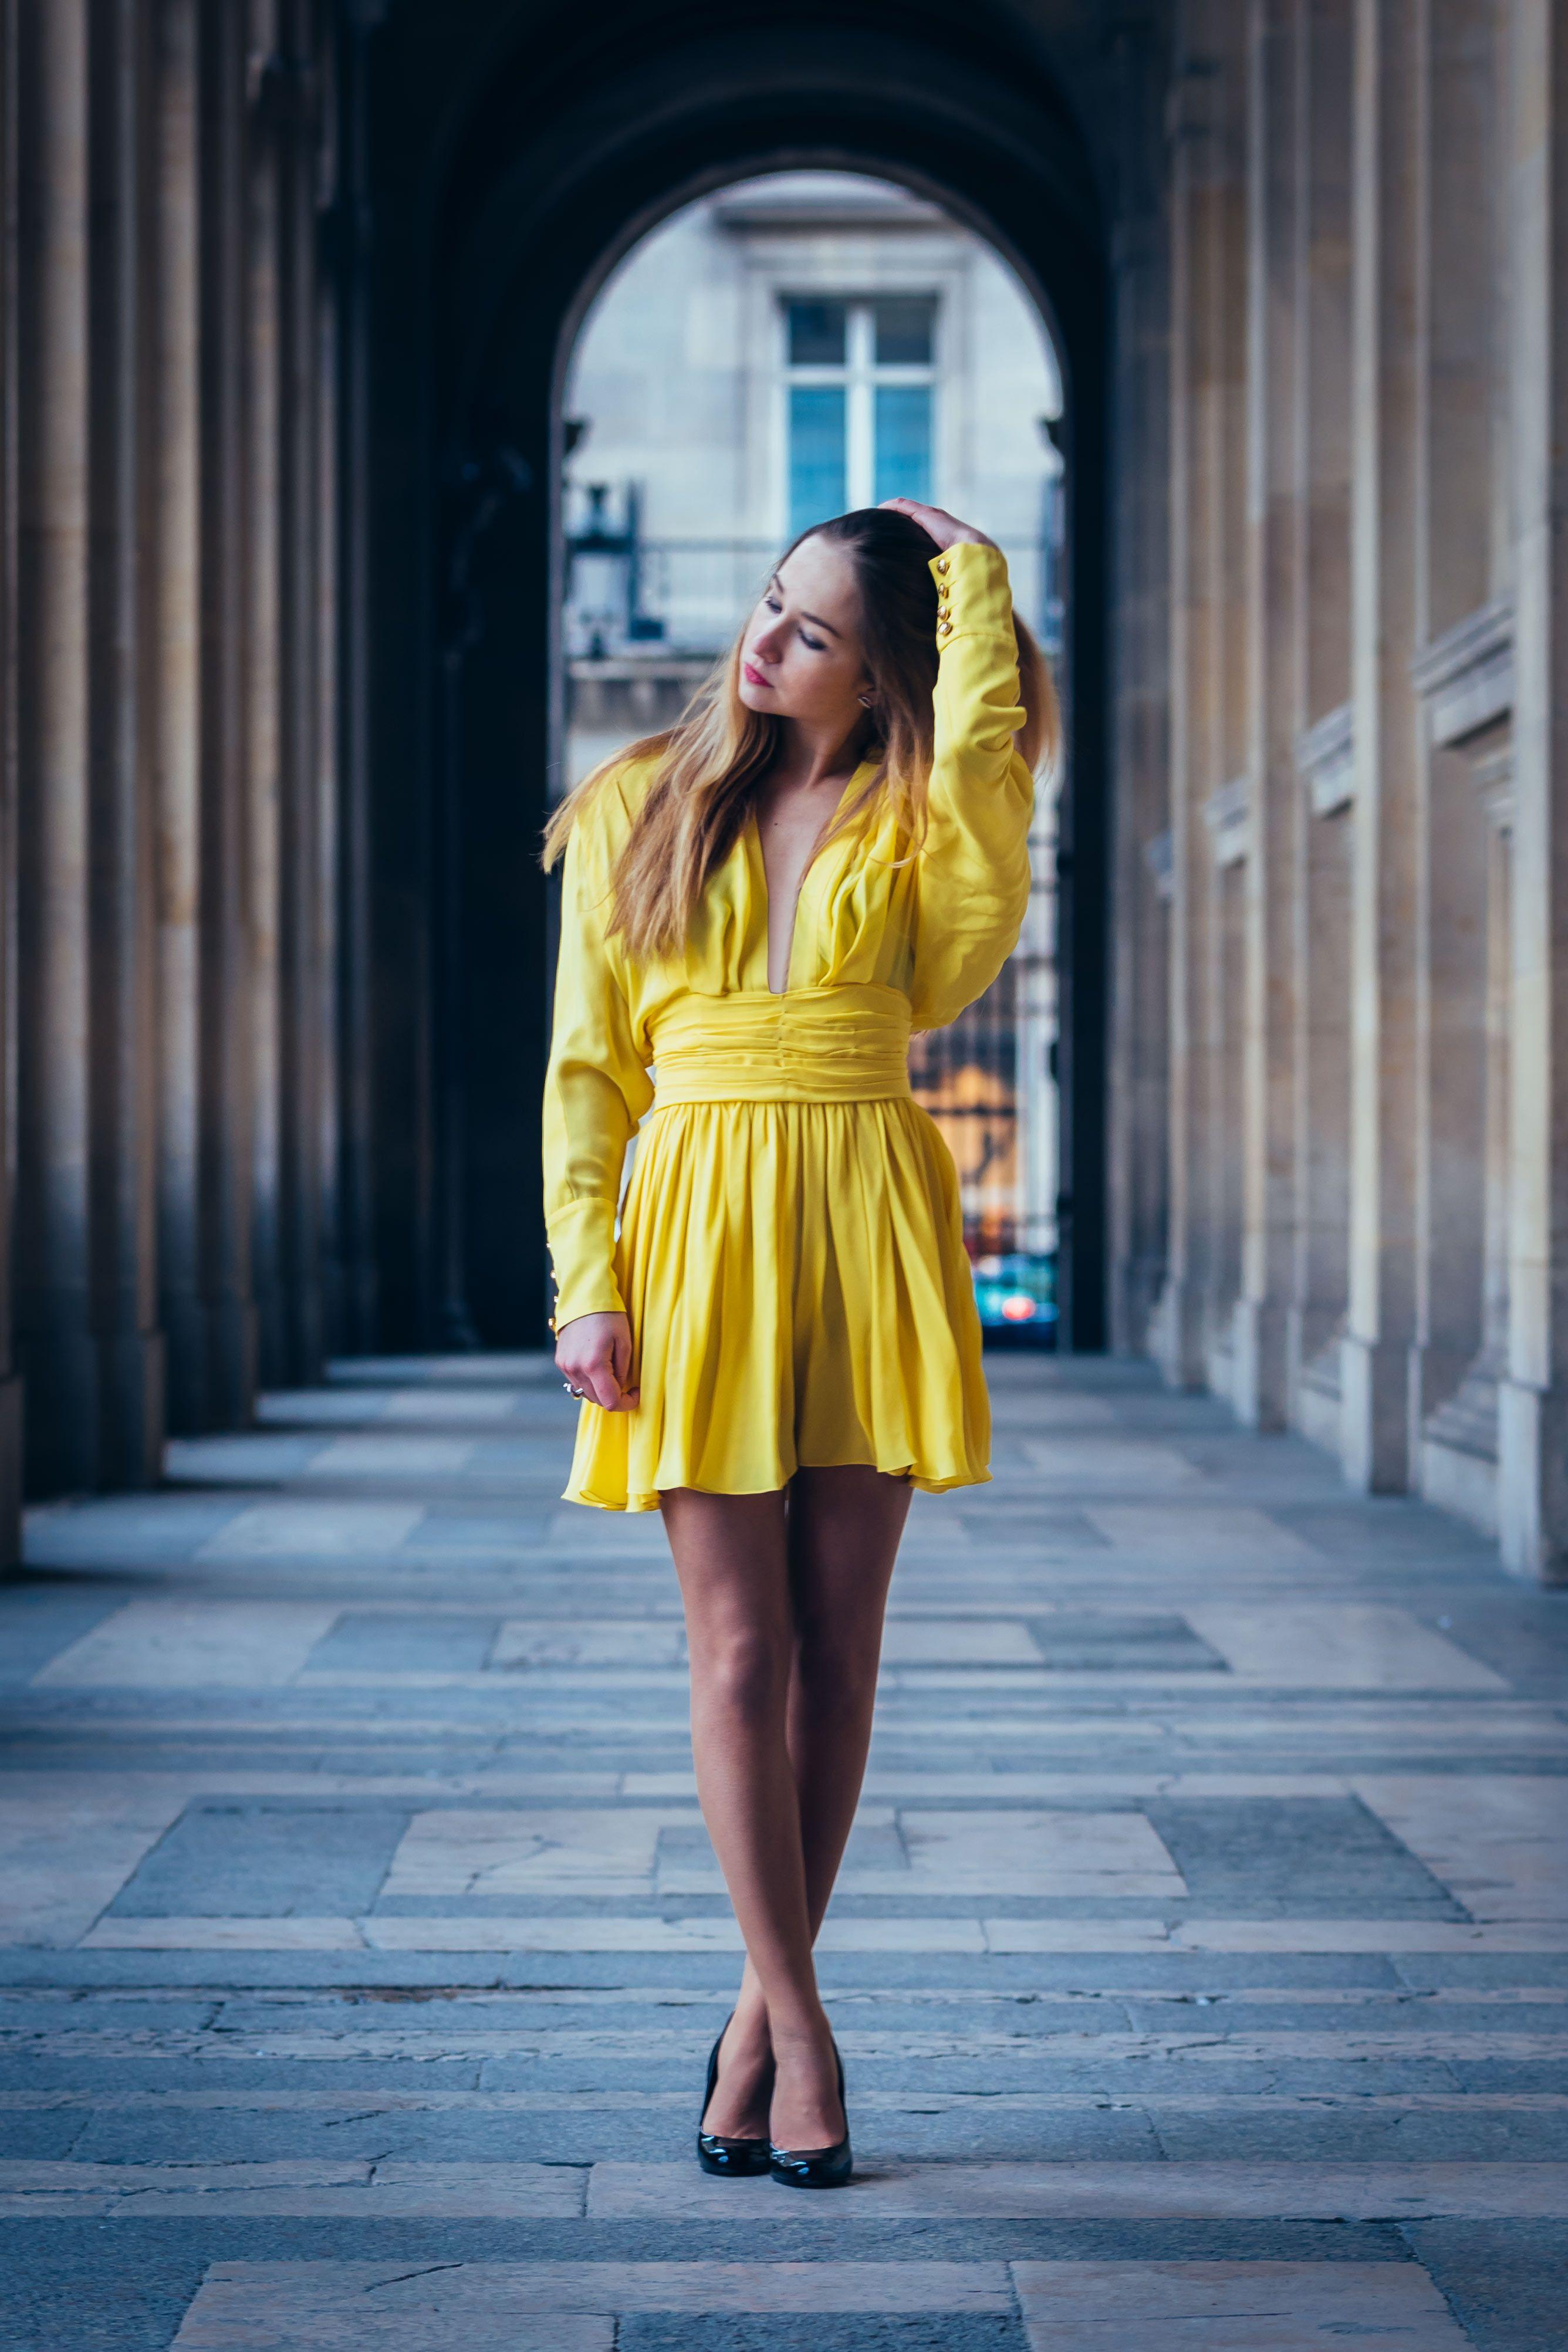 magnifique robe de soir e balmain qui s 39 accordera parfaitement avec une pochette chanel robe